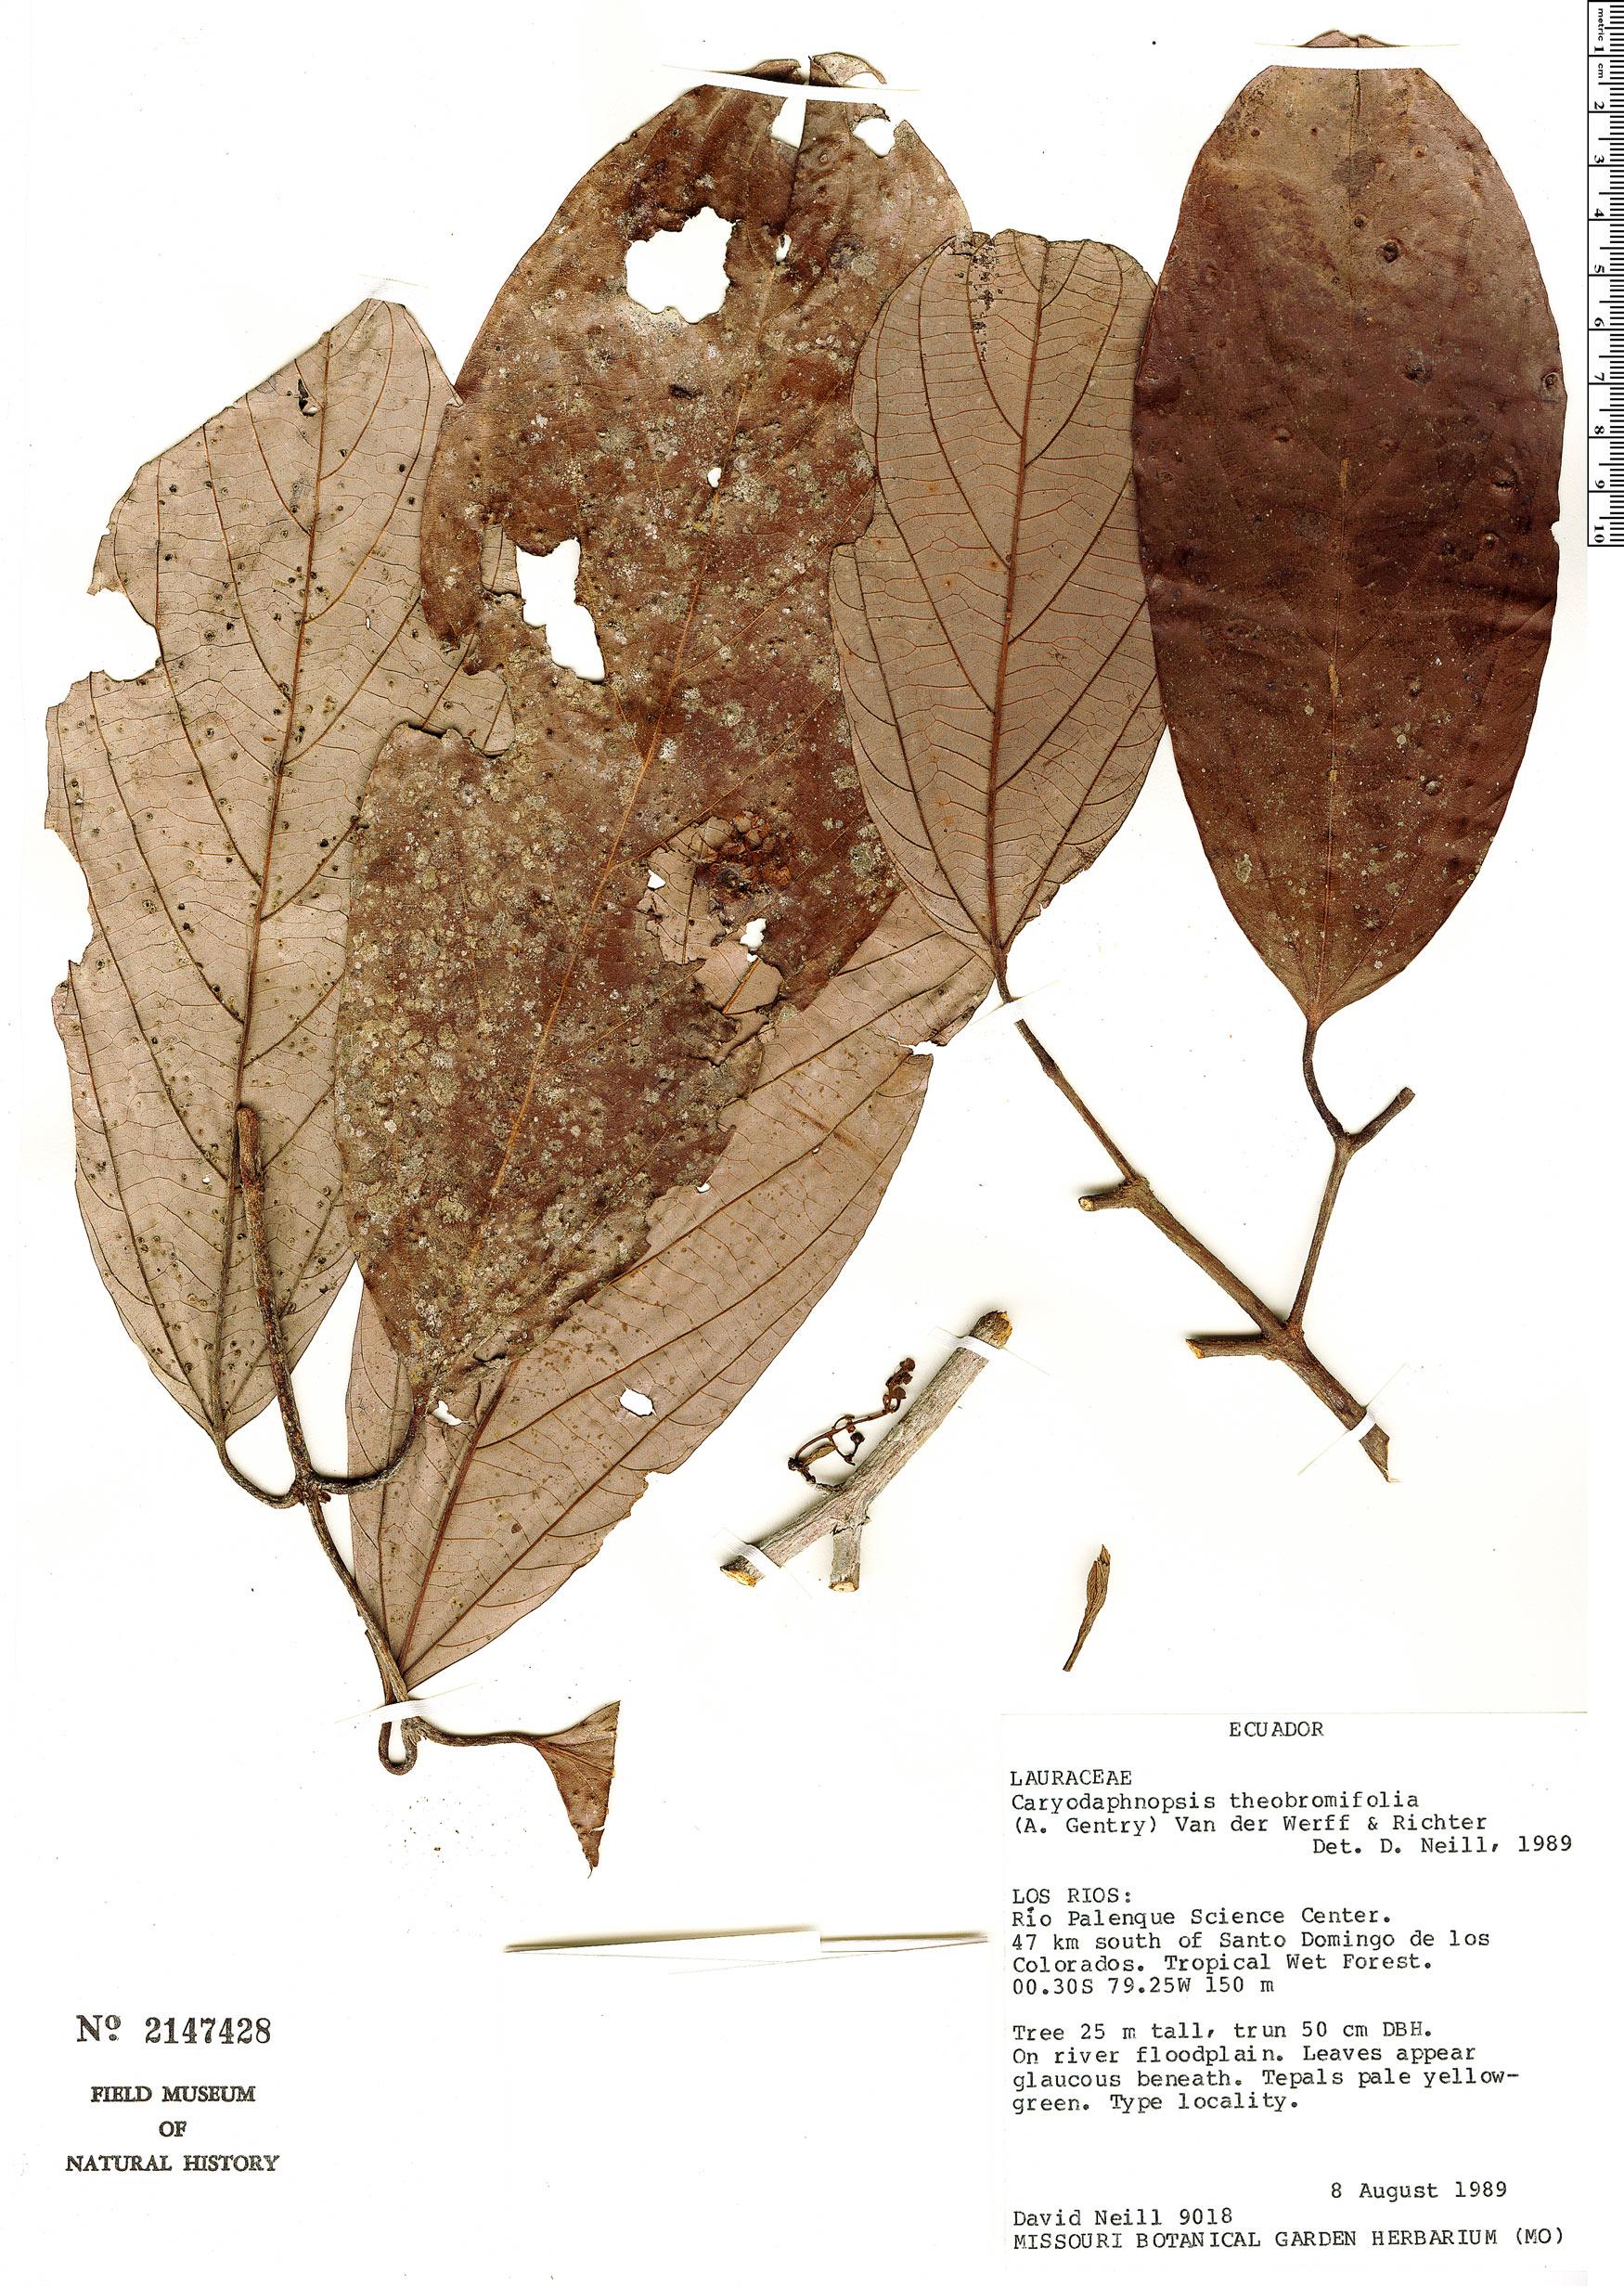 Specimen: Caryodaphnopsis theobromifolia